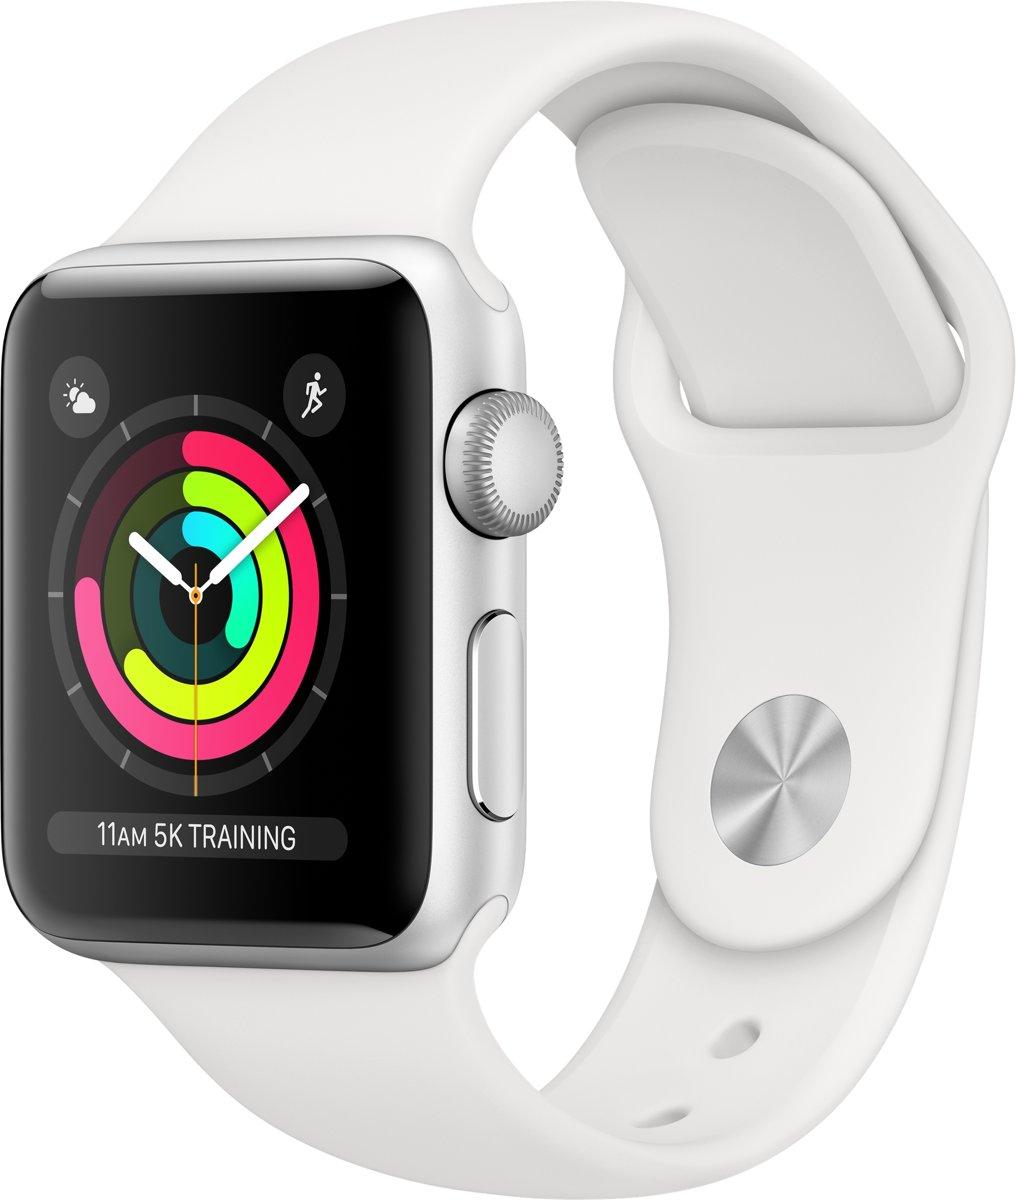 Apple Watch Series 3 - 38mm Zilver Aluminum / Wit Sportbandje (GPS)